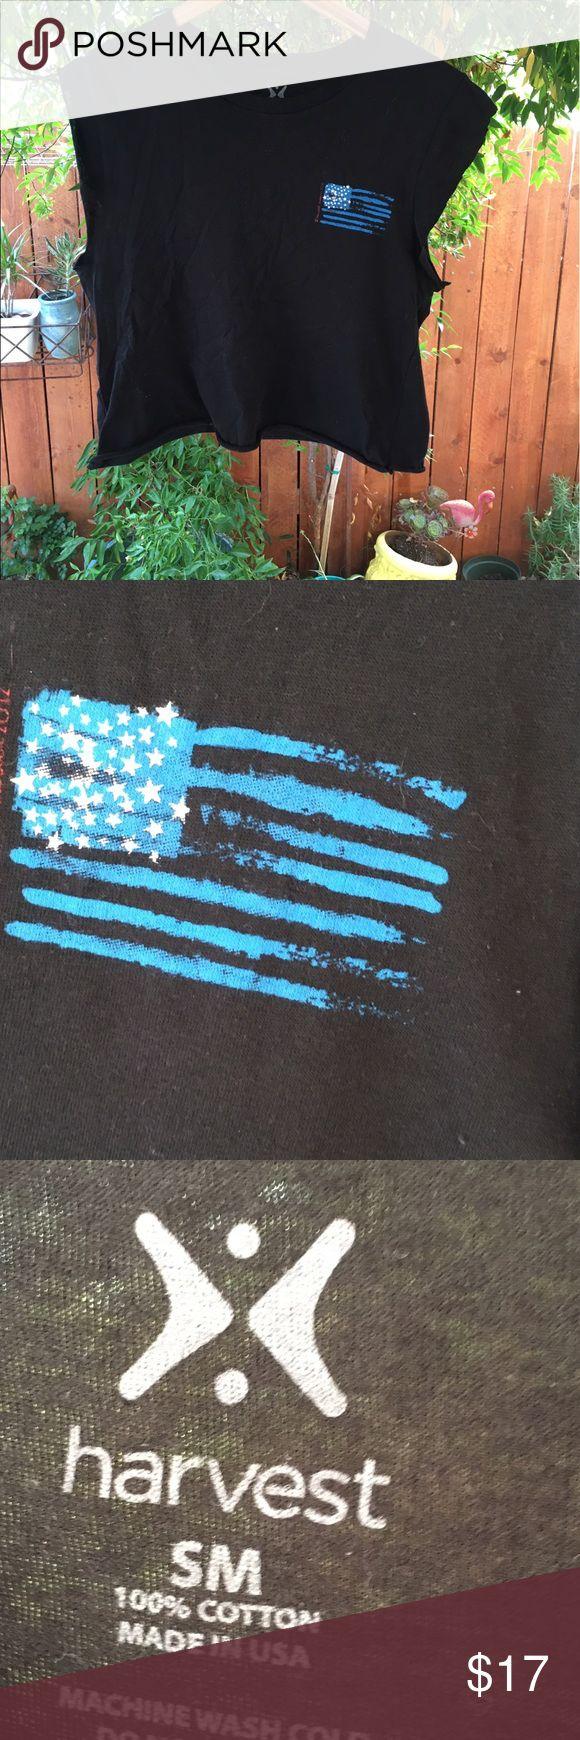 Altered cut cropped T-shirt USA American flag Alter T-shirt fits most women medium perfect PJ top summer wear harvest Tops Crop Tops